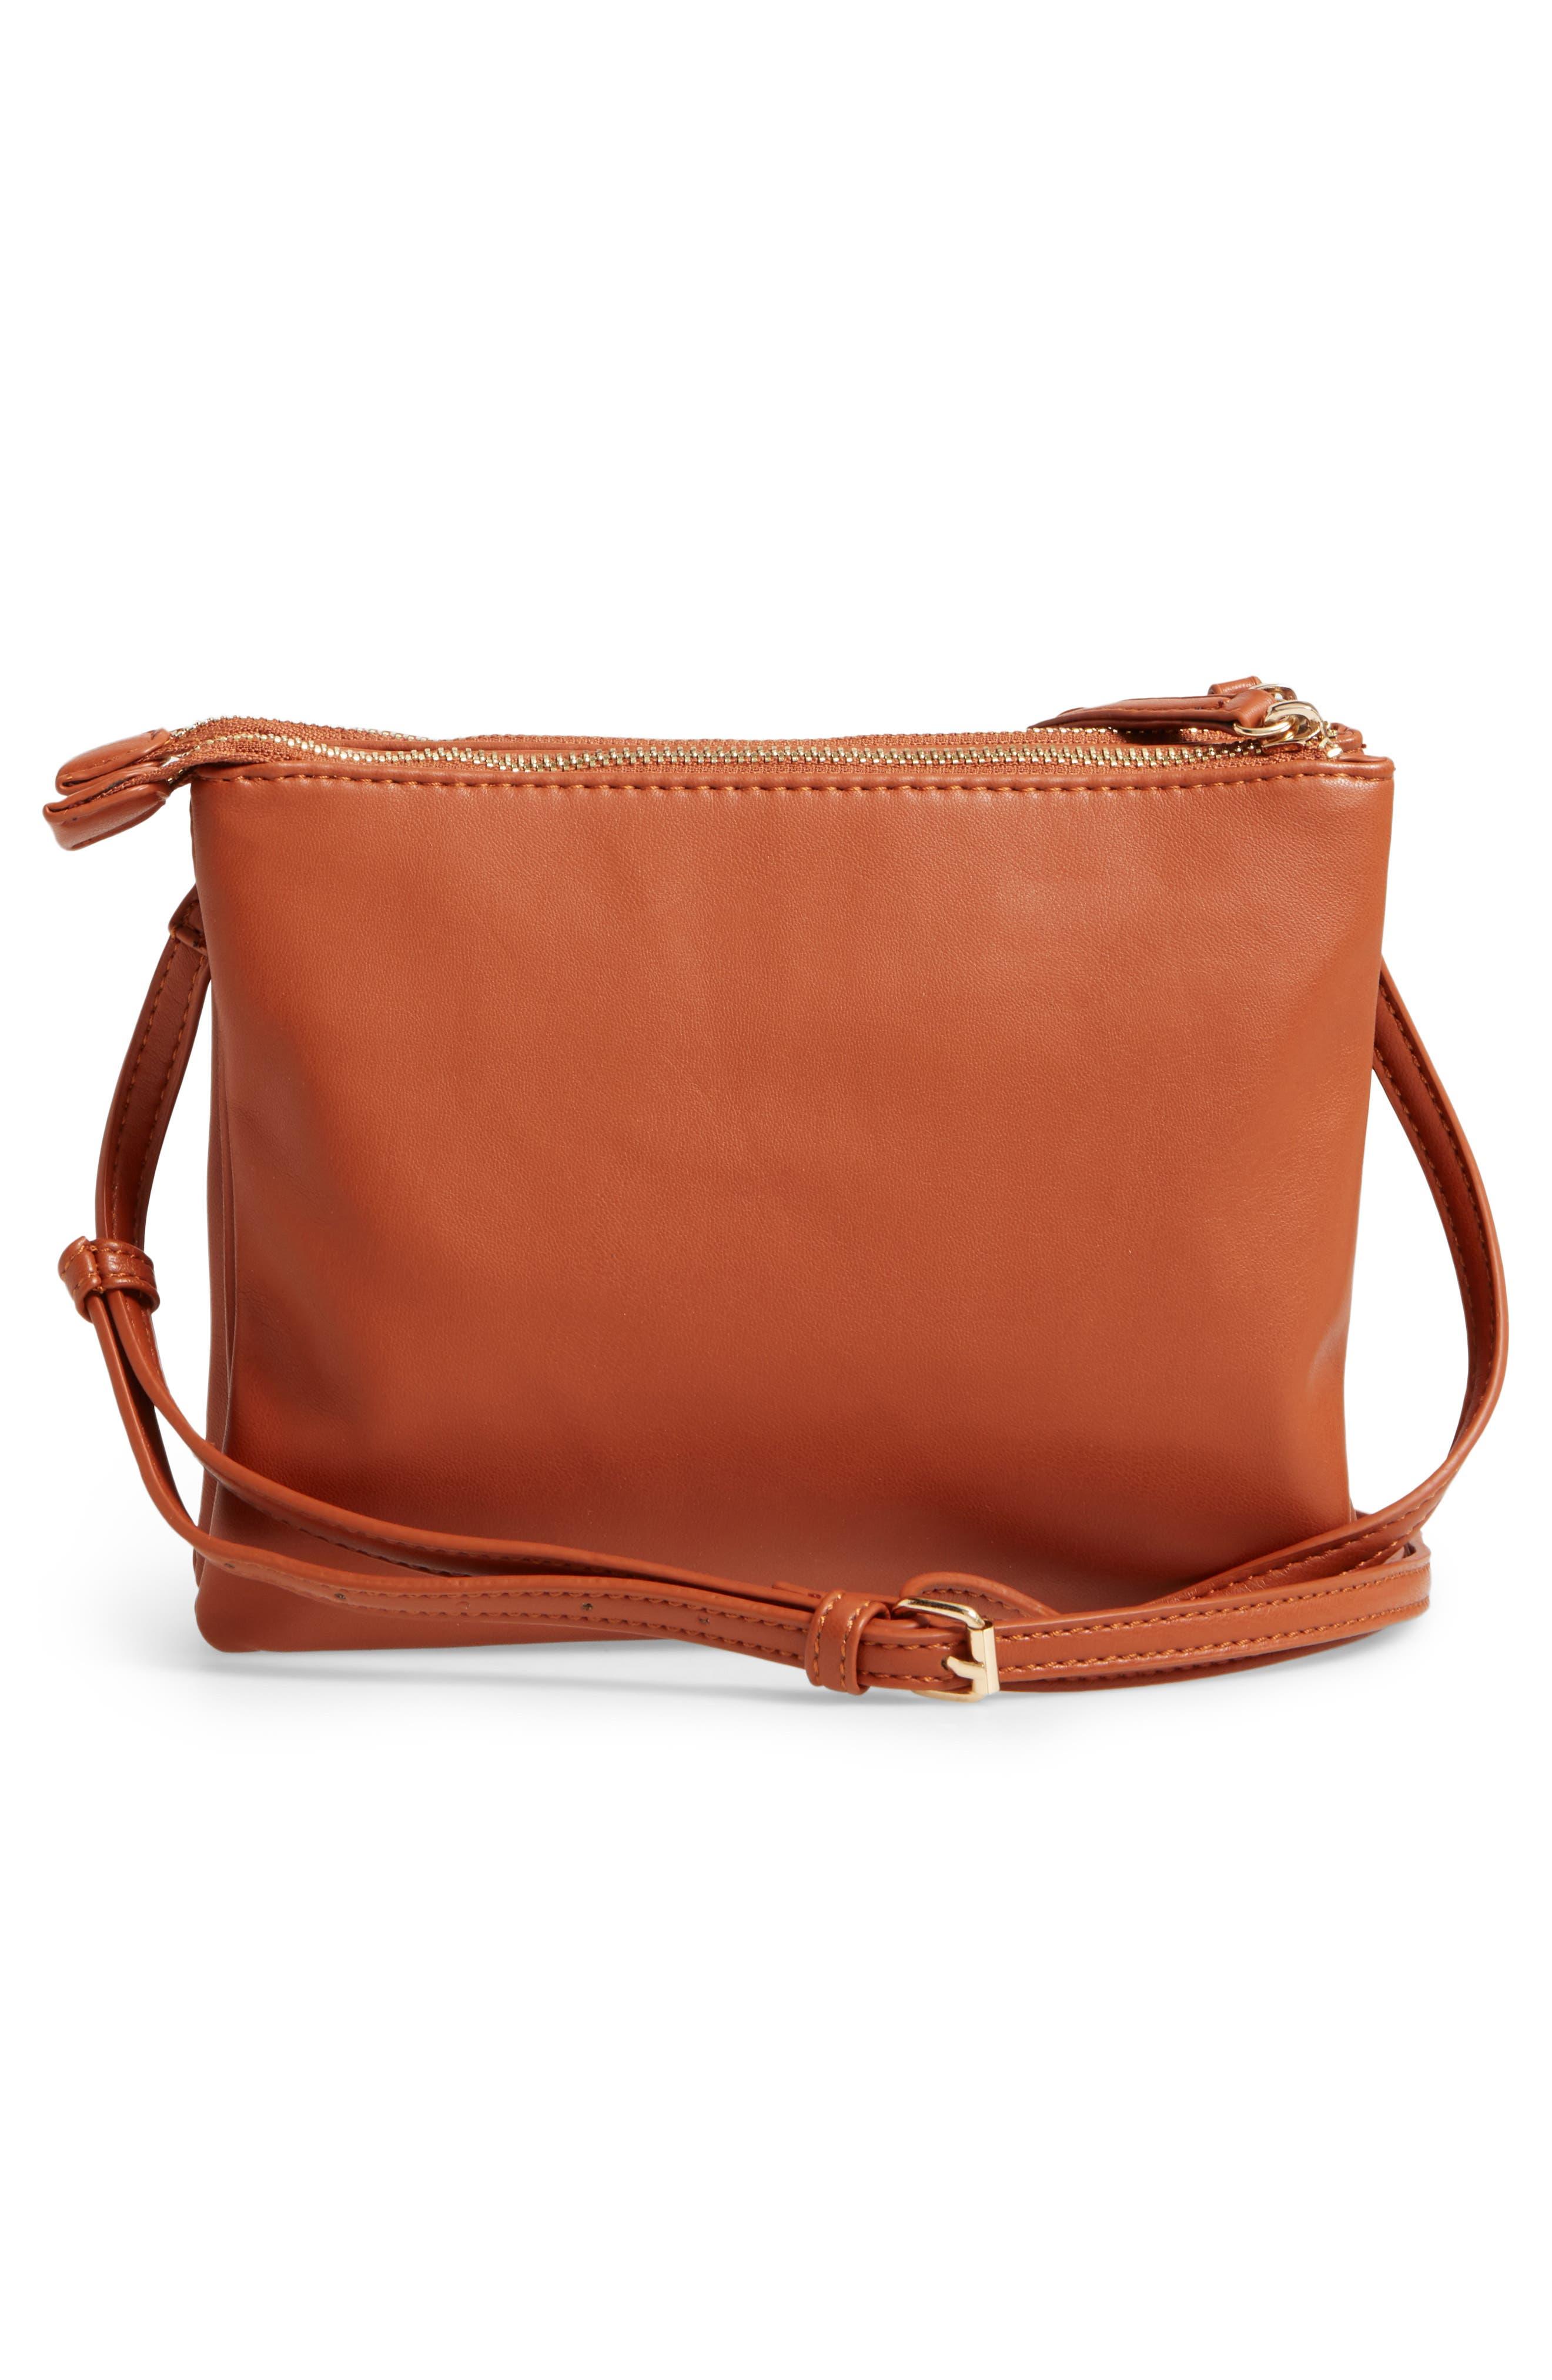 Madden Faux Leather Pouch Crossbody Bag,                             Alternate thumbnail 2, color,                             Cognac